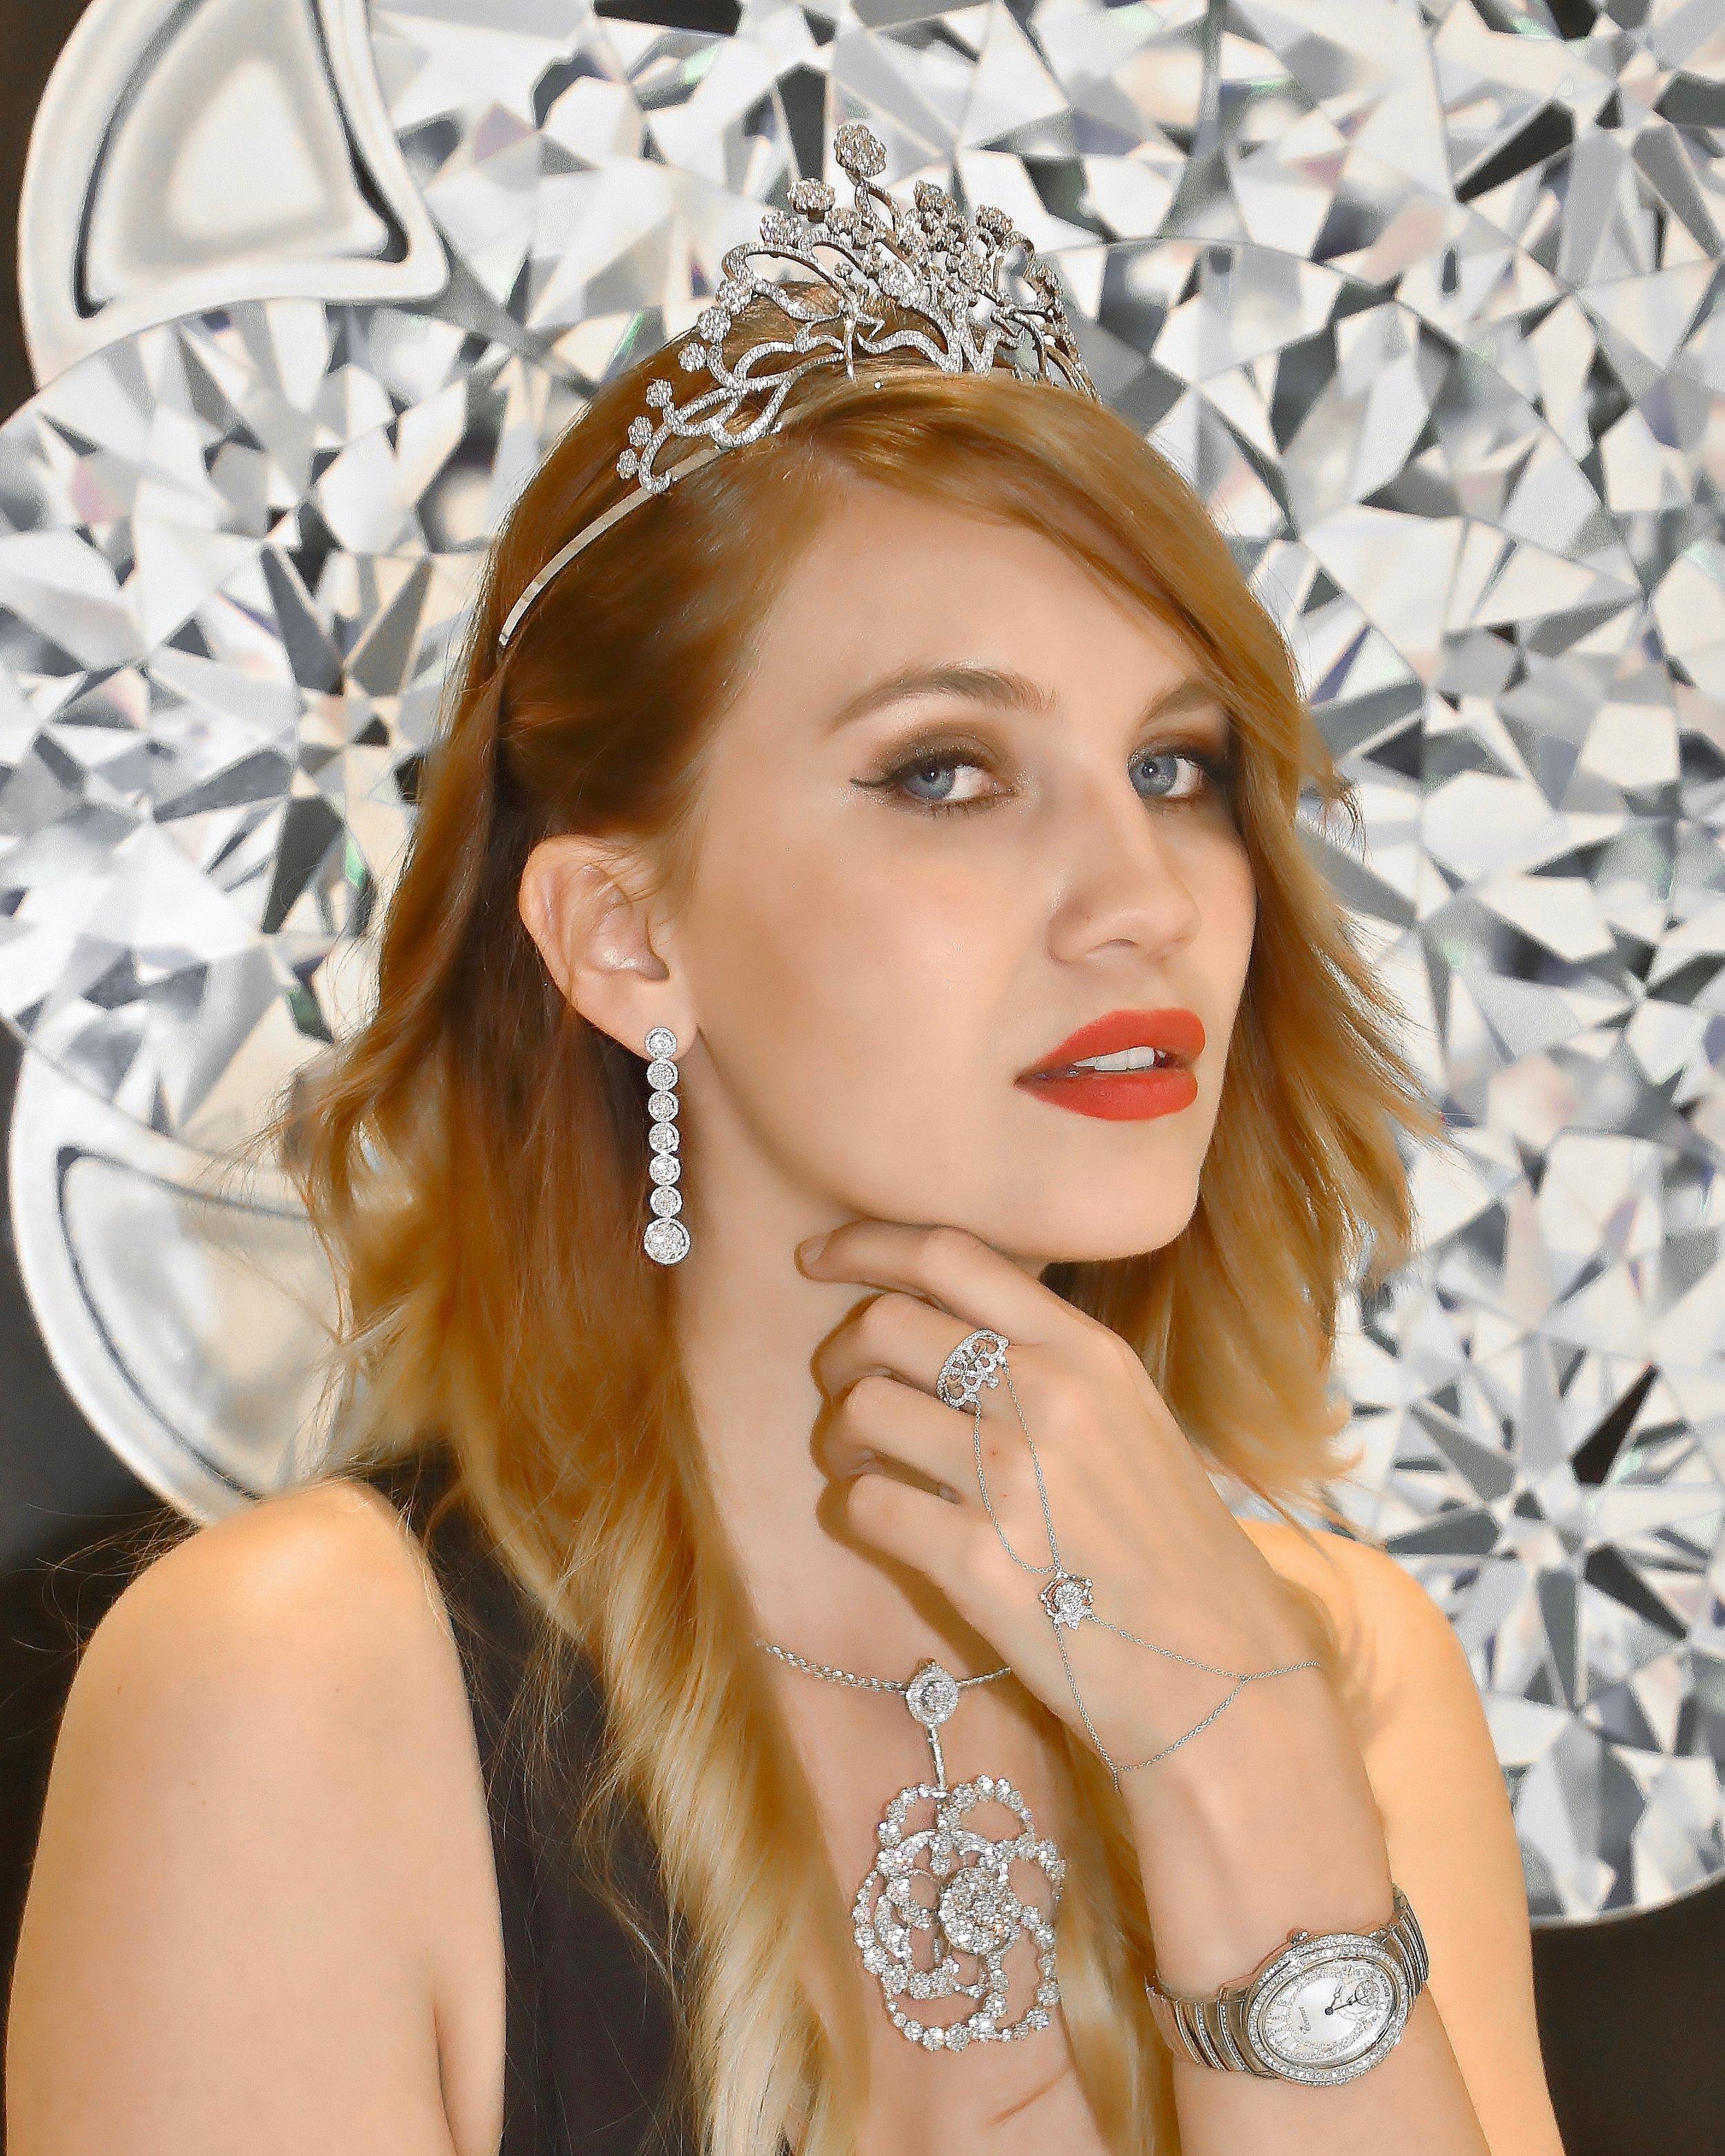 Coronet By Reena Ahluwalia_Inner Brilliance Diamond Necklace_Ring_Kerstin Cook_Image credit Abdou Hilali_2.jpg